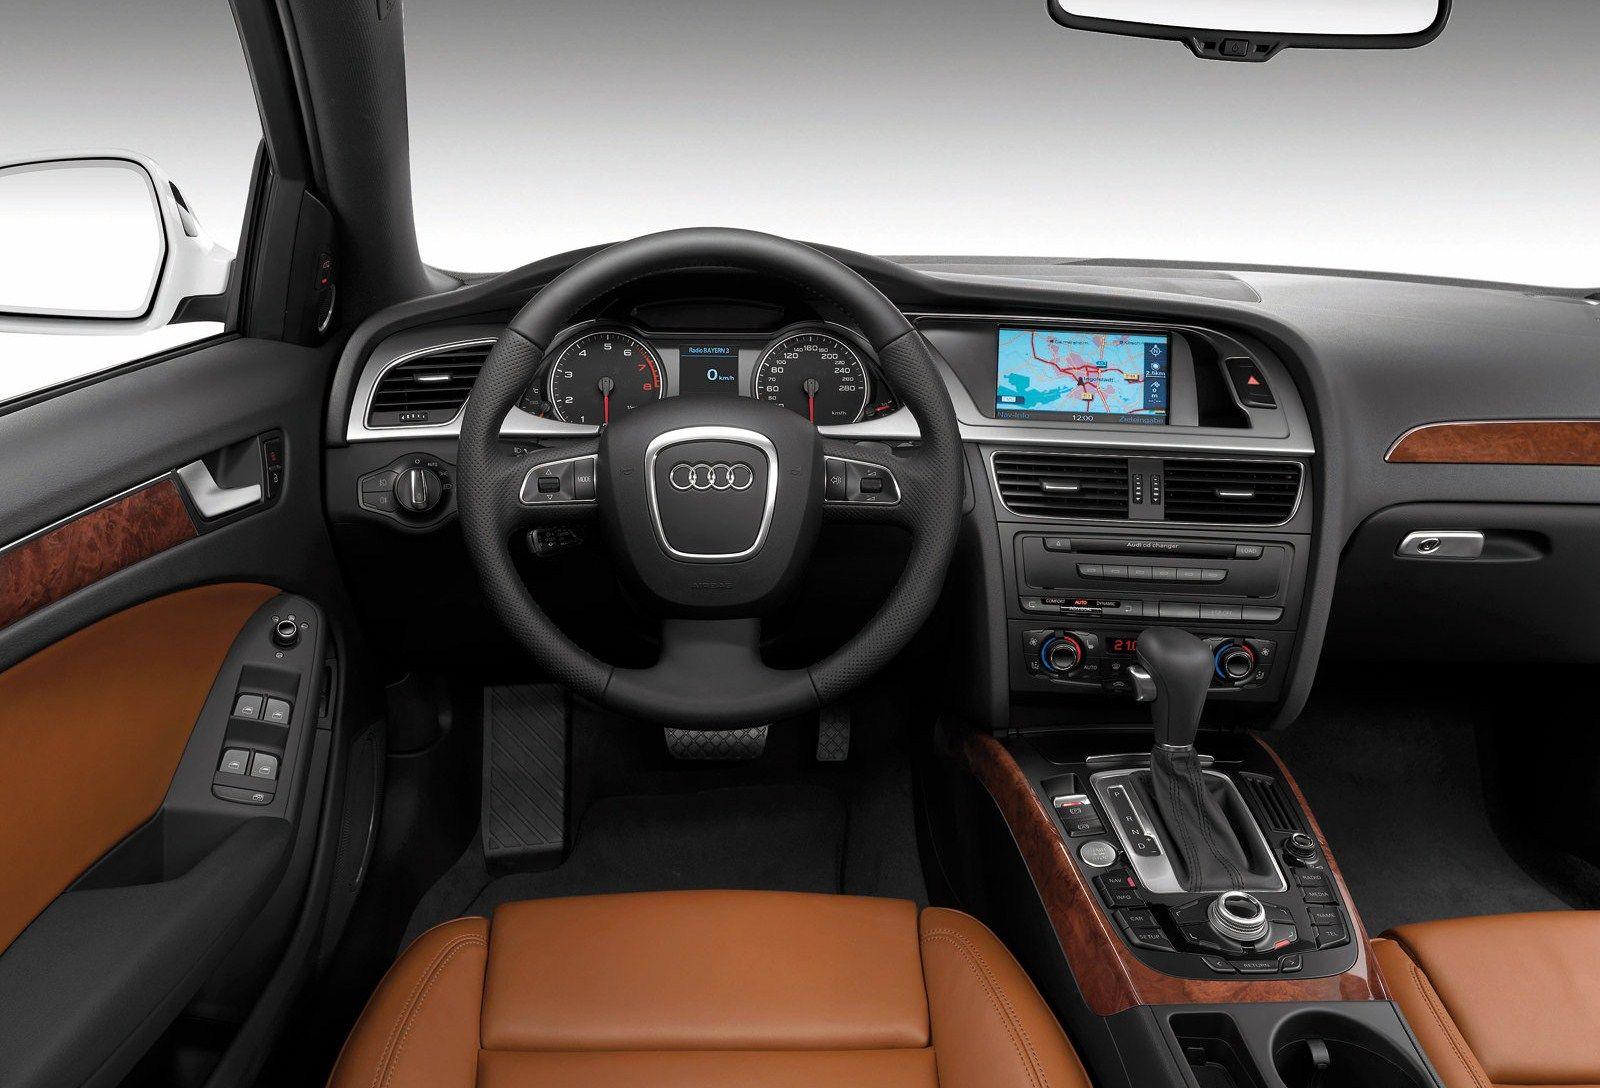 Audi A4 Interior Hd Wallpaper Cars Audi A4 Audi Audi Cars